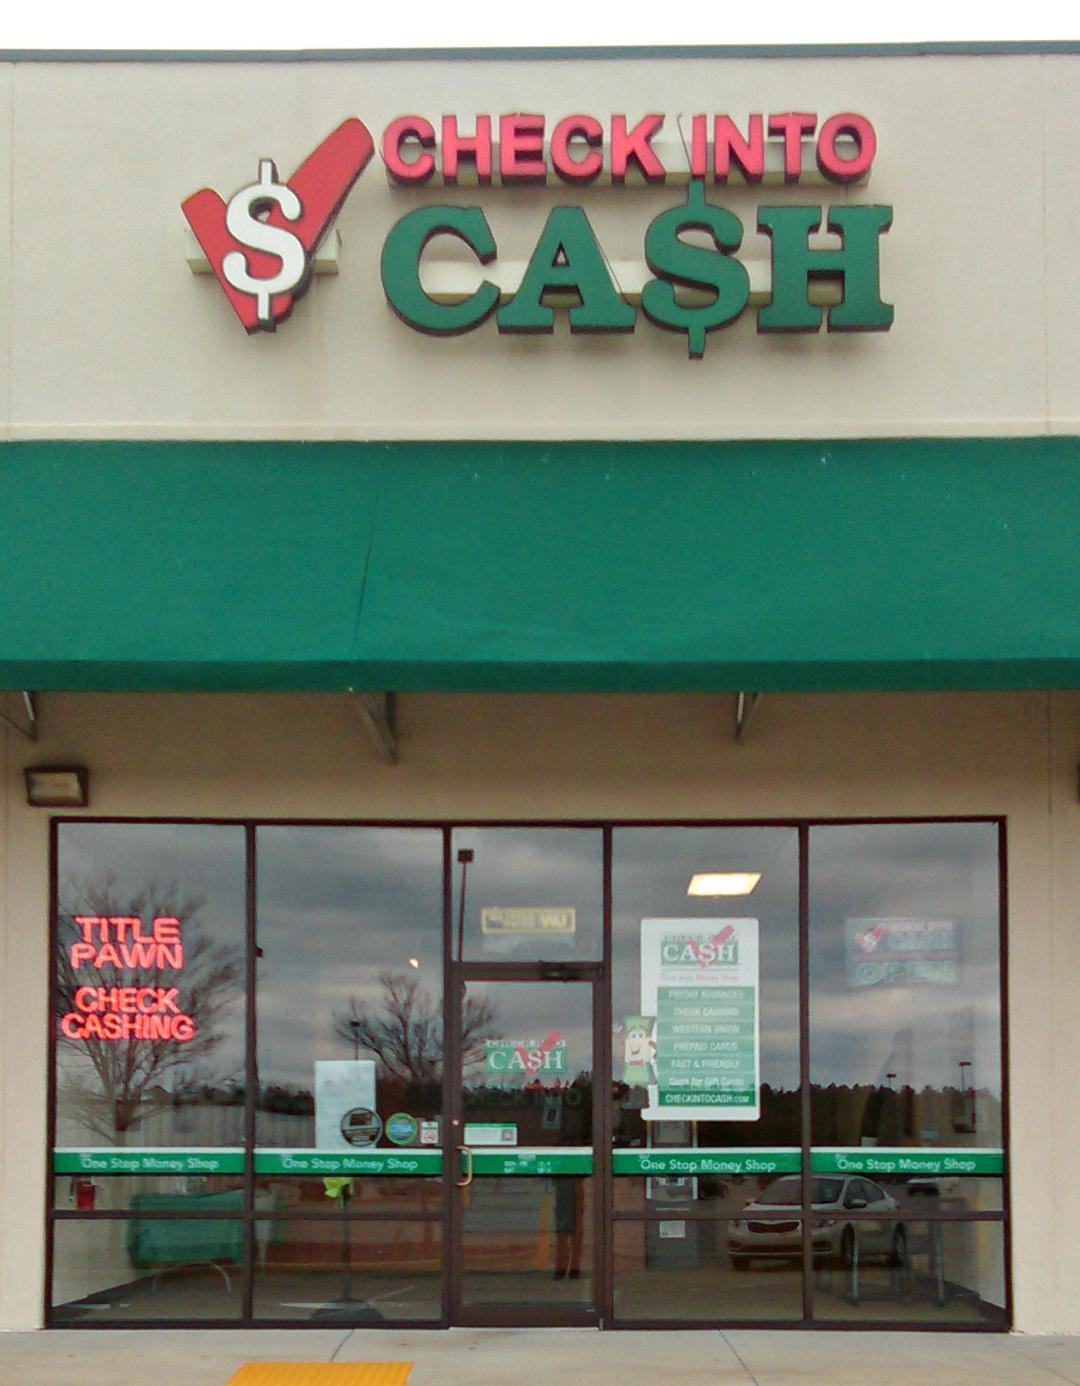 All those merged creates high rise in popularity of payday advances everywhere, like North Dakota.